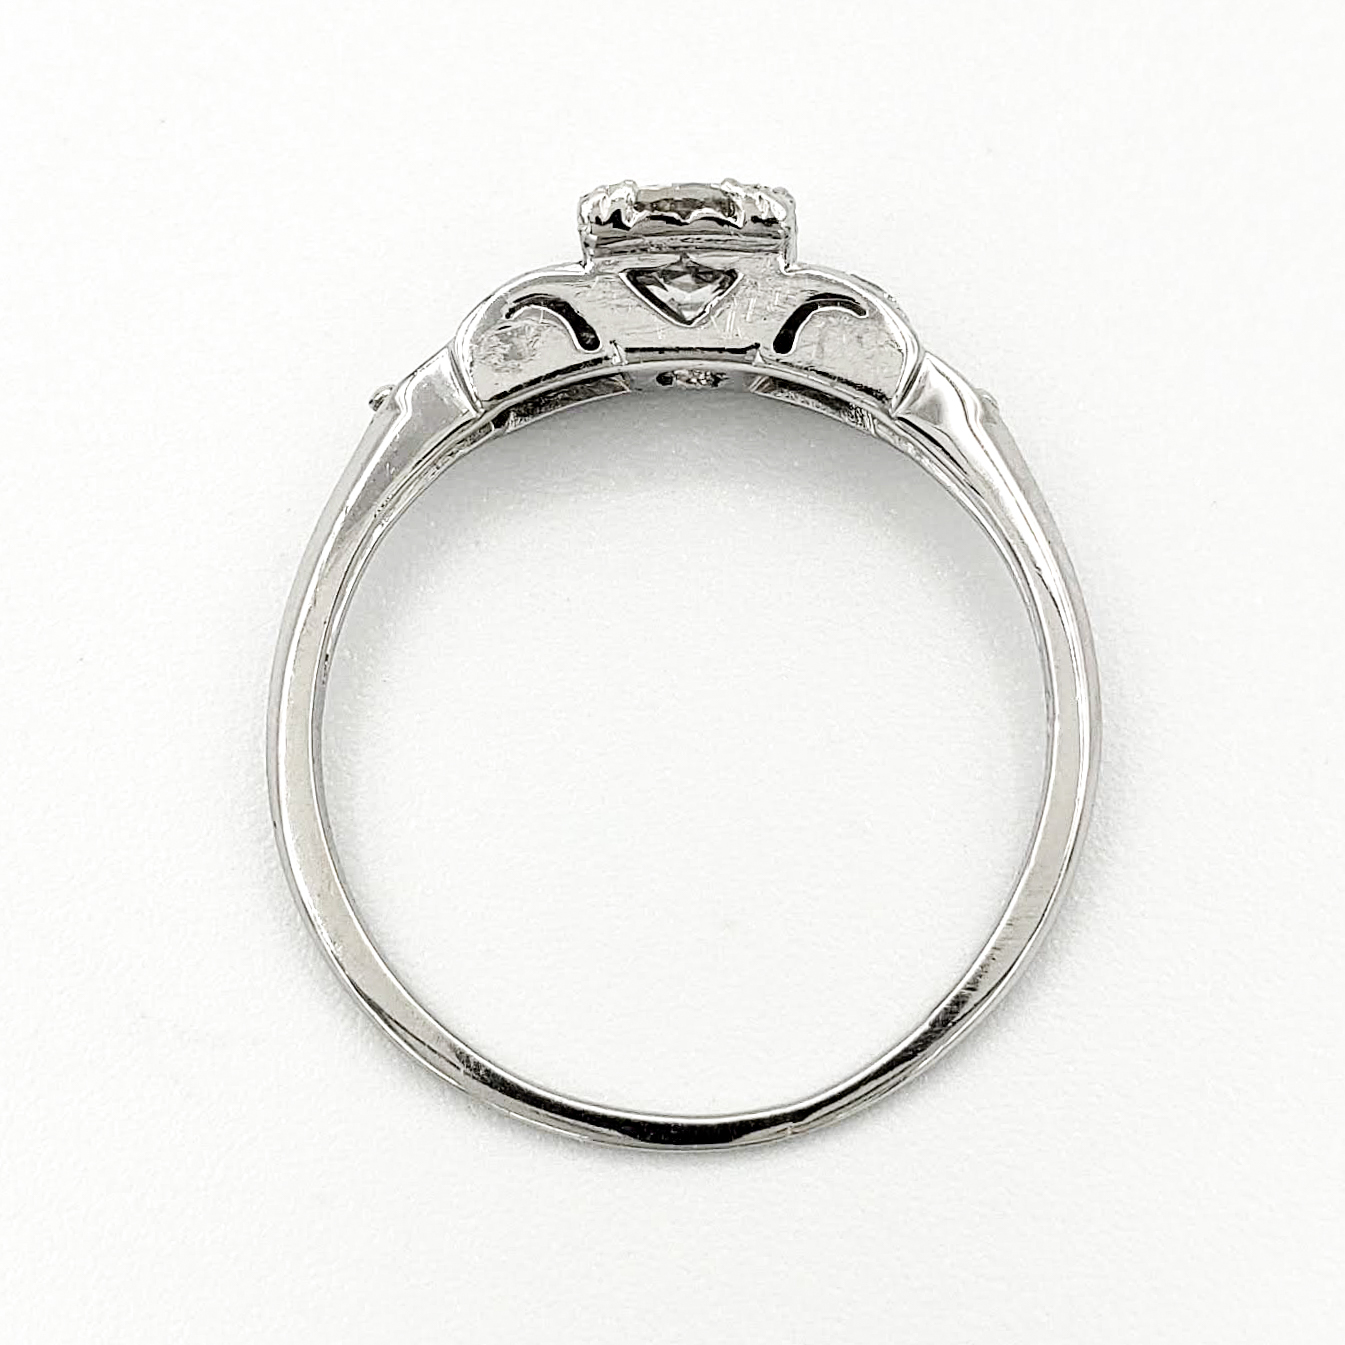 vintage-platinum-engagement-ring-with-0-46-carat-transitional-cut-diamond-egl-g-vs1